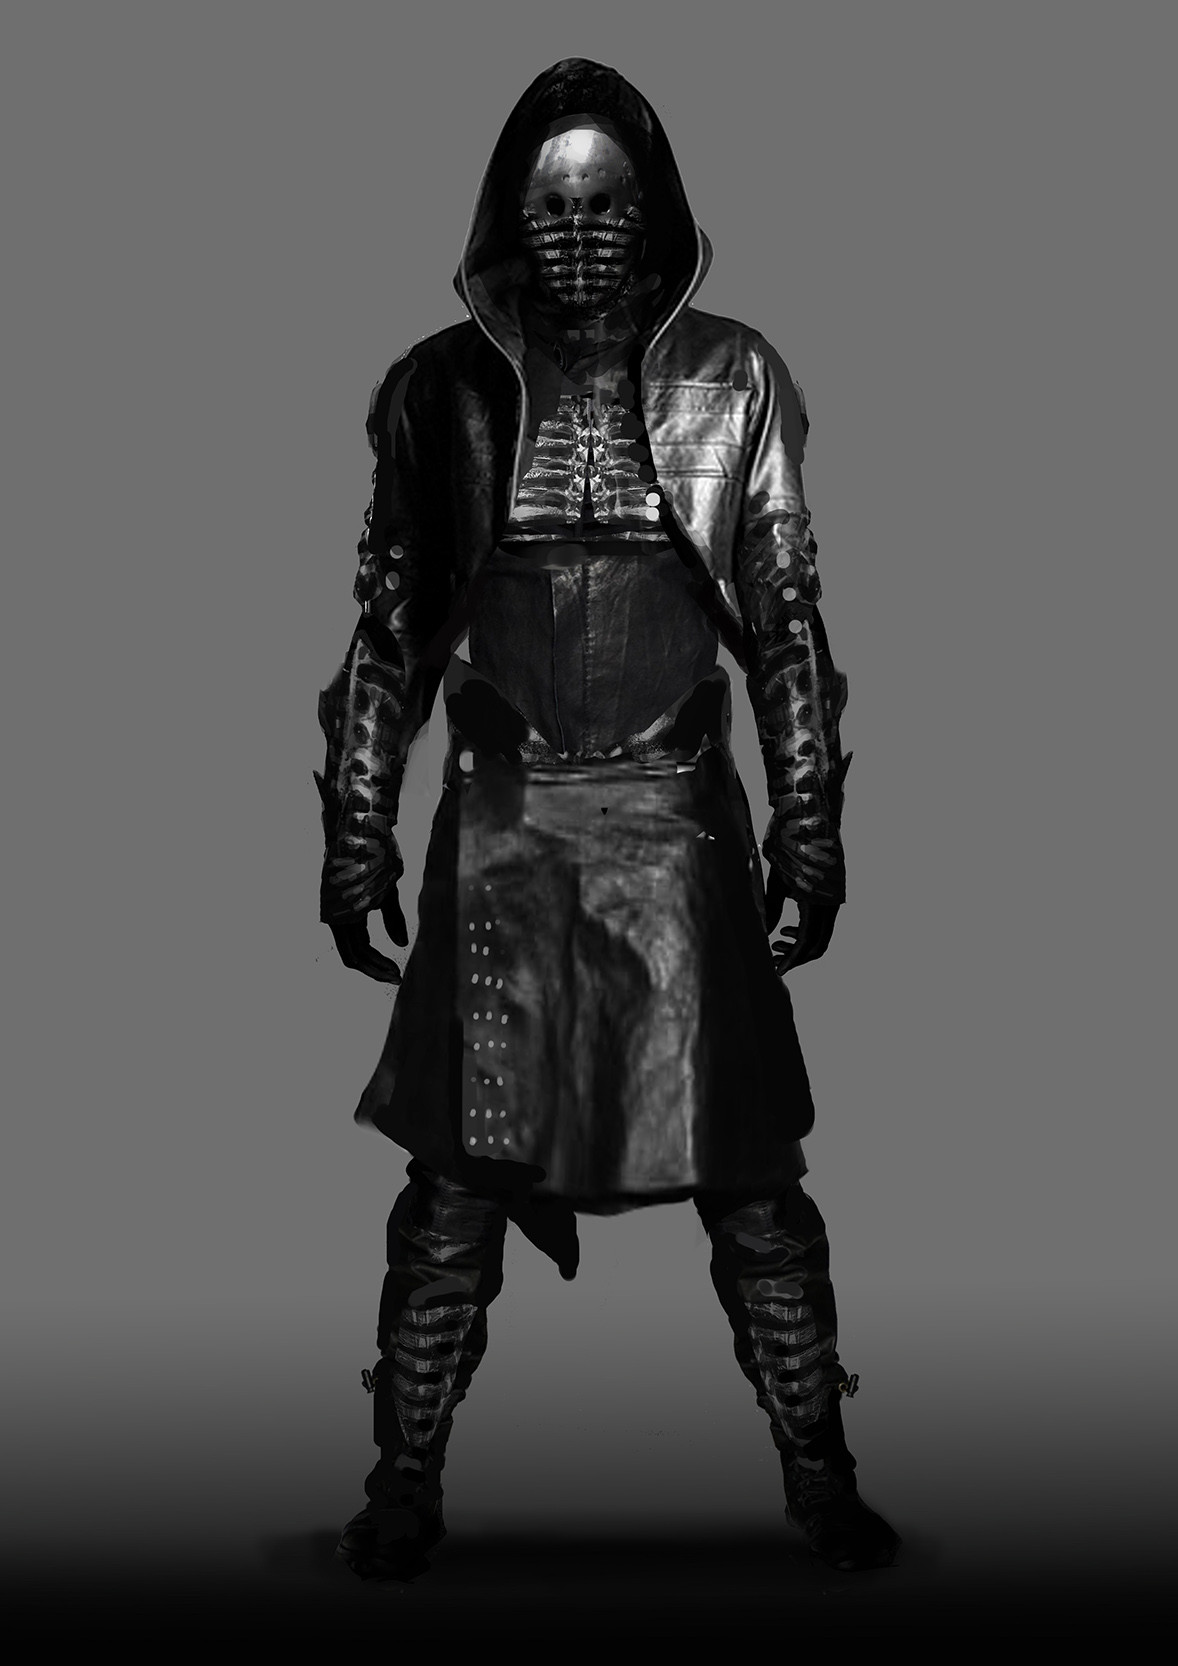 Andrei riabovitchev armor v03